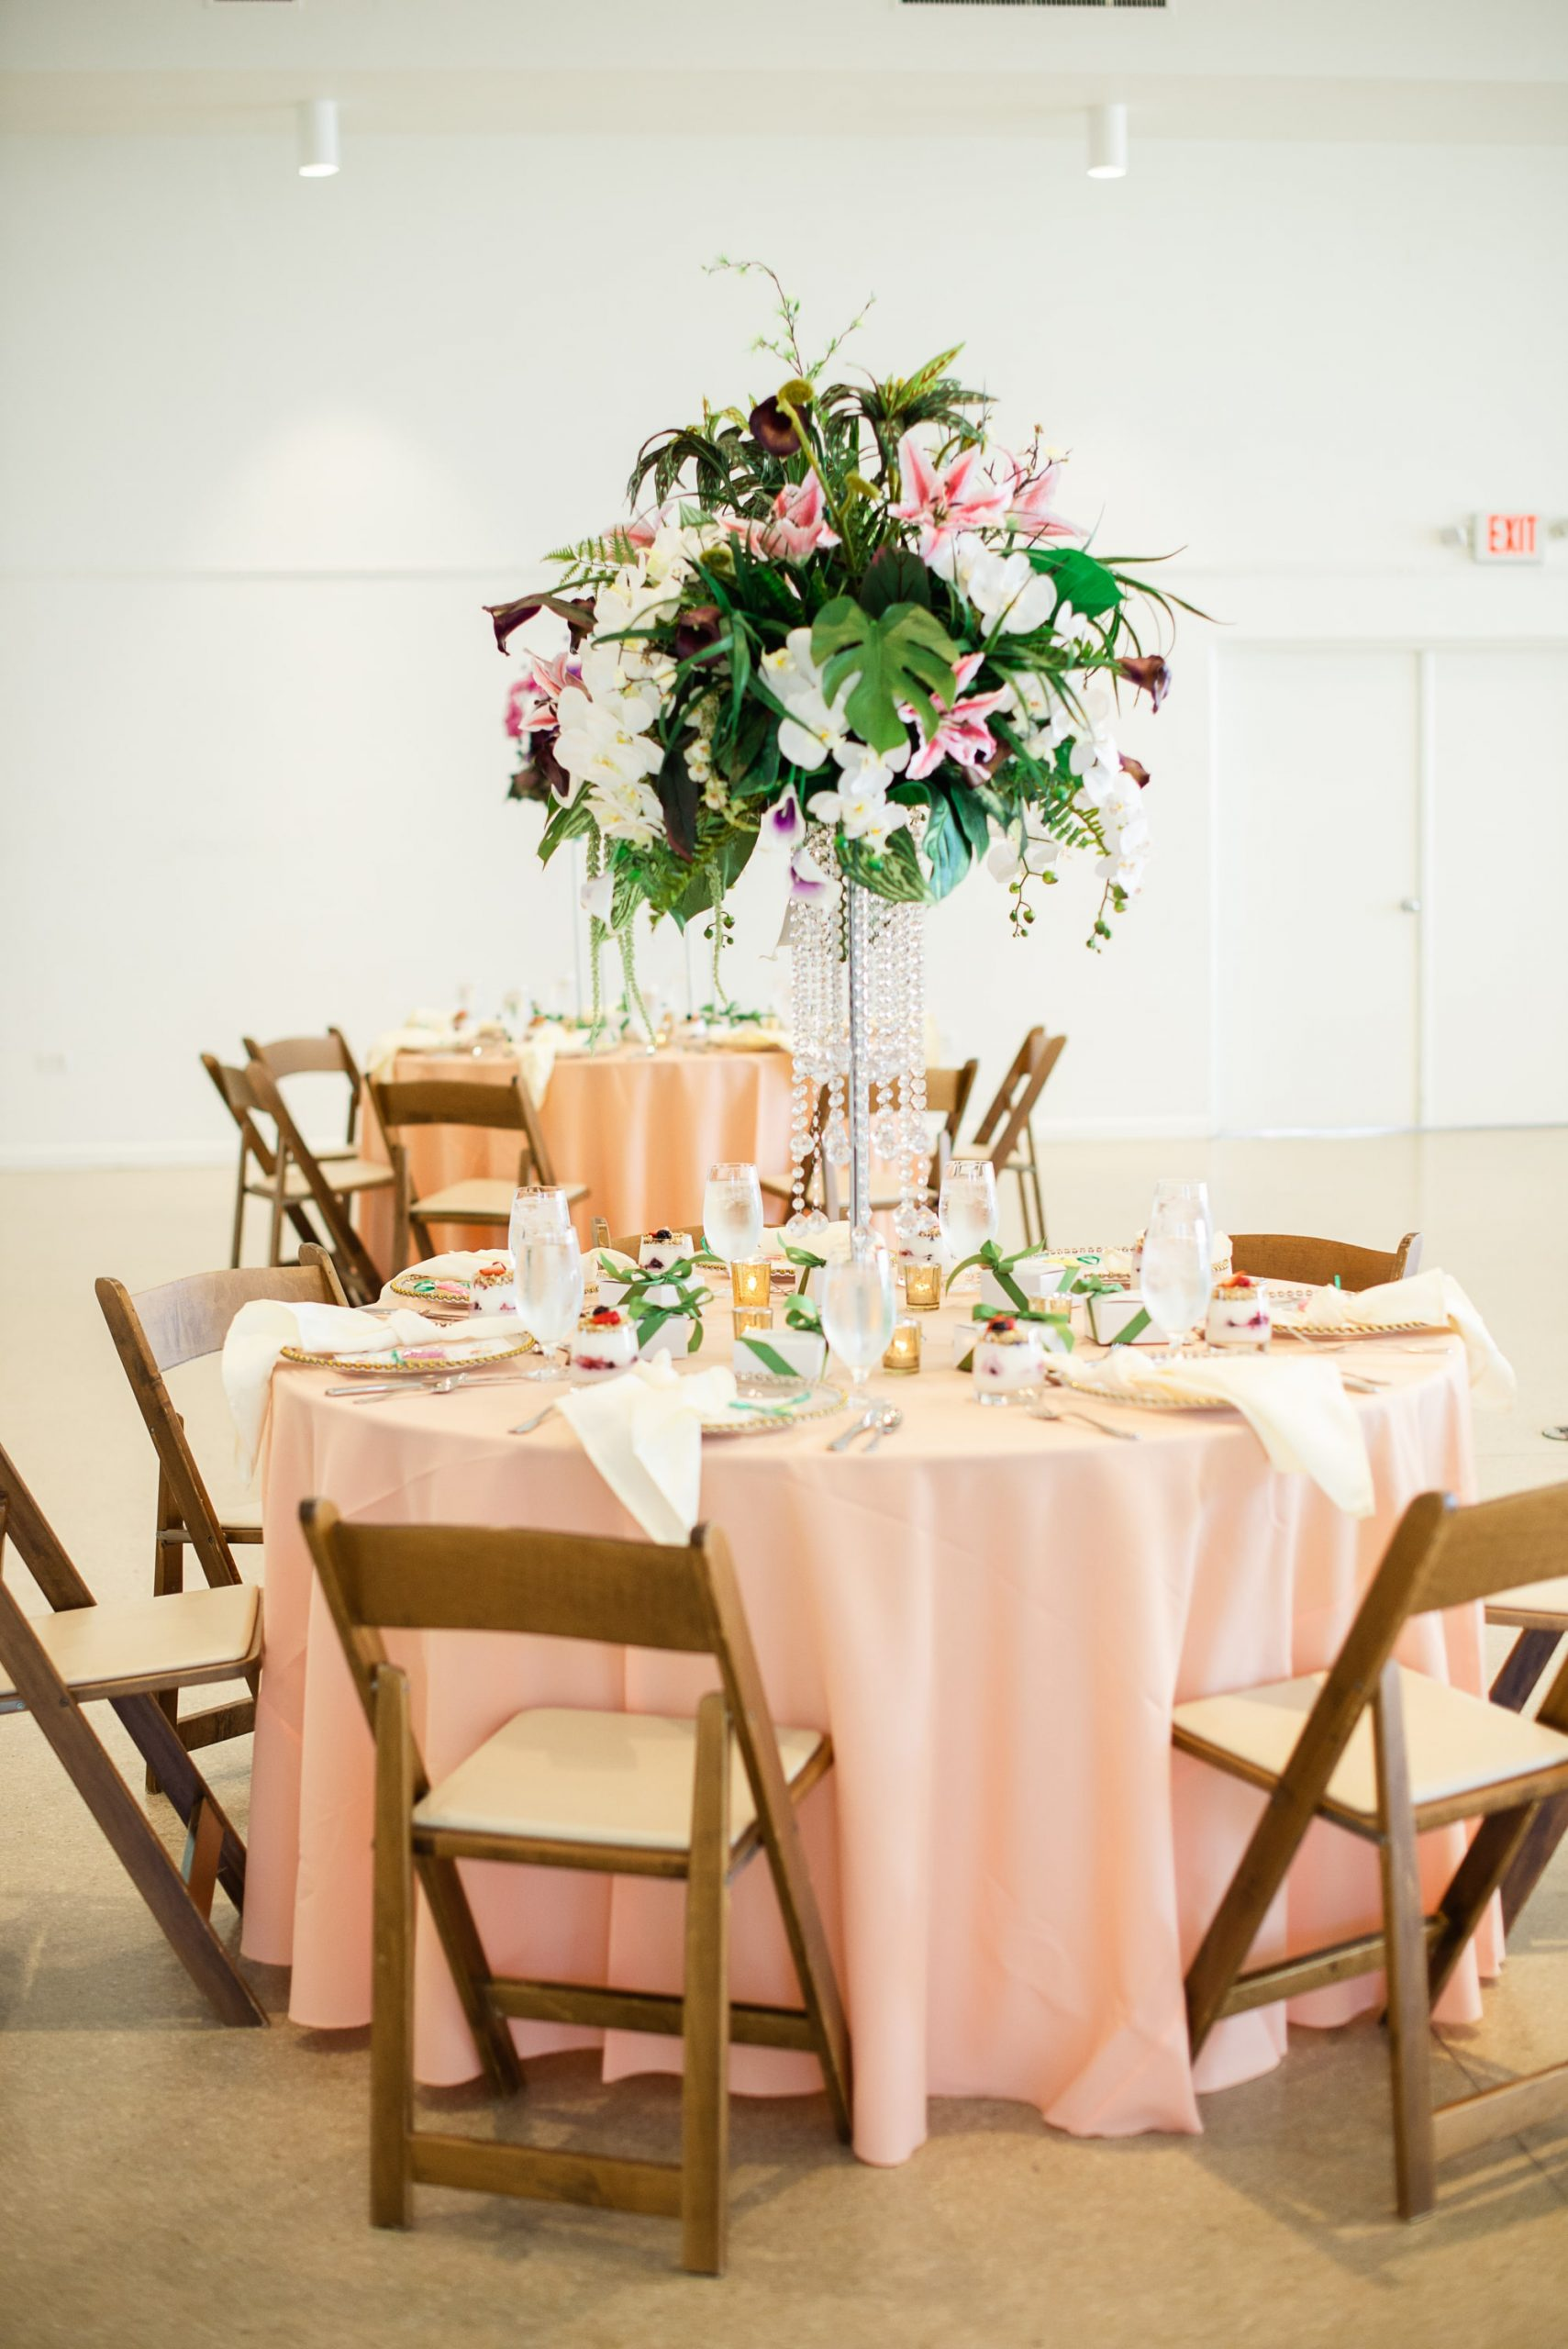 Tampa Wedding, Outdoor Wedding, Tampa Floral, Tampa Garden Club, TGC, Tampa Event, Tampa Decor